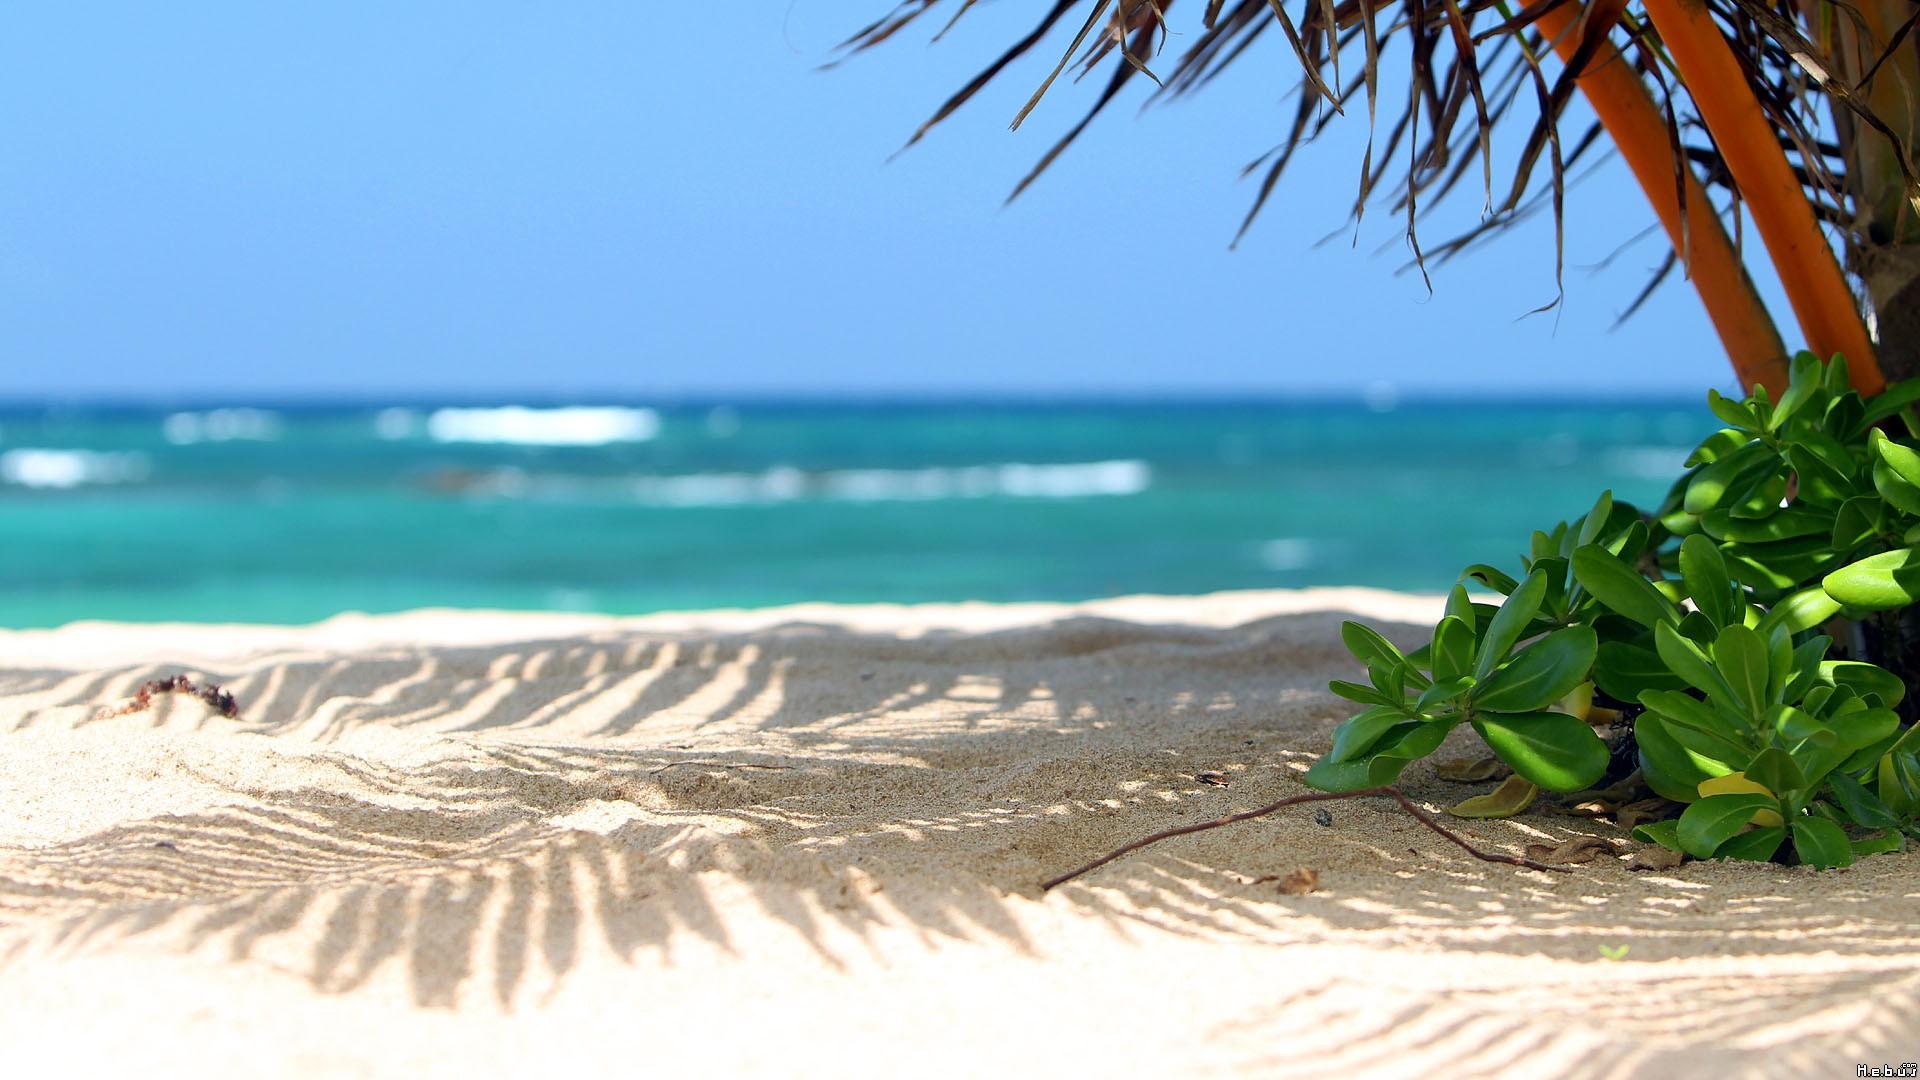 beautiful-beach-scenery-1 (1920×1080)   scenery board